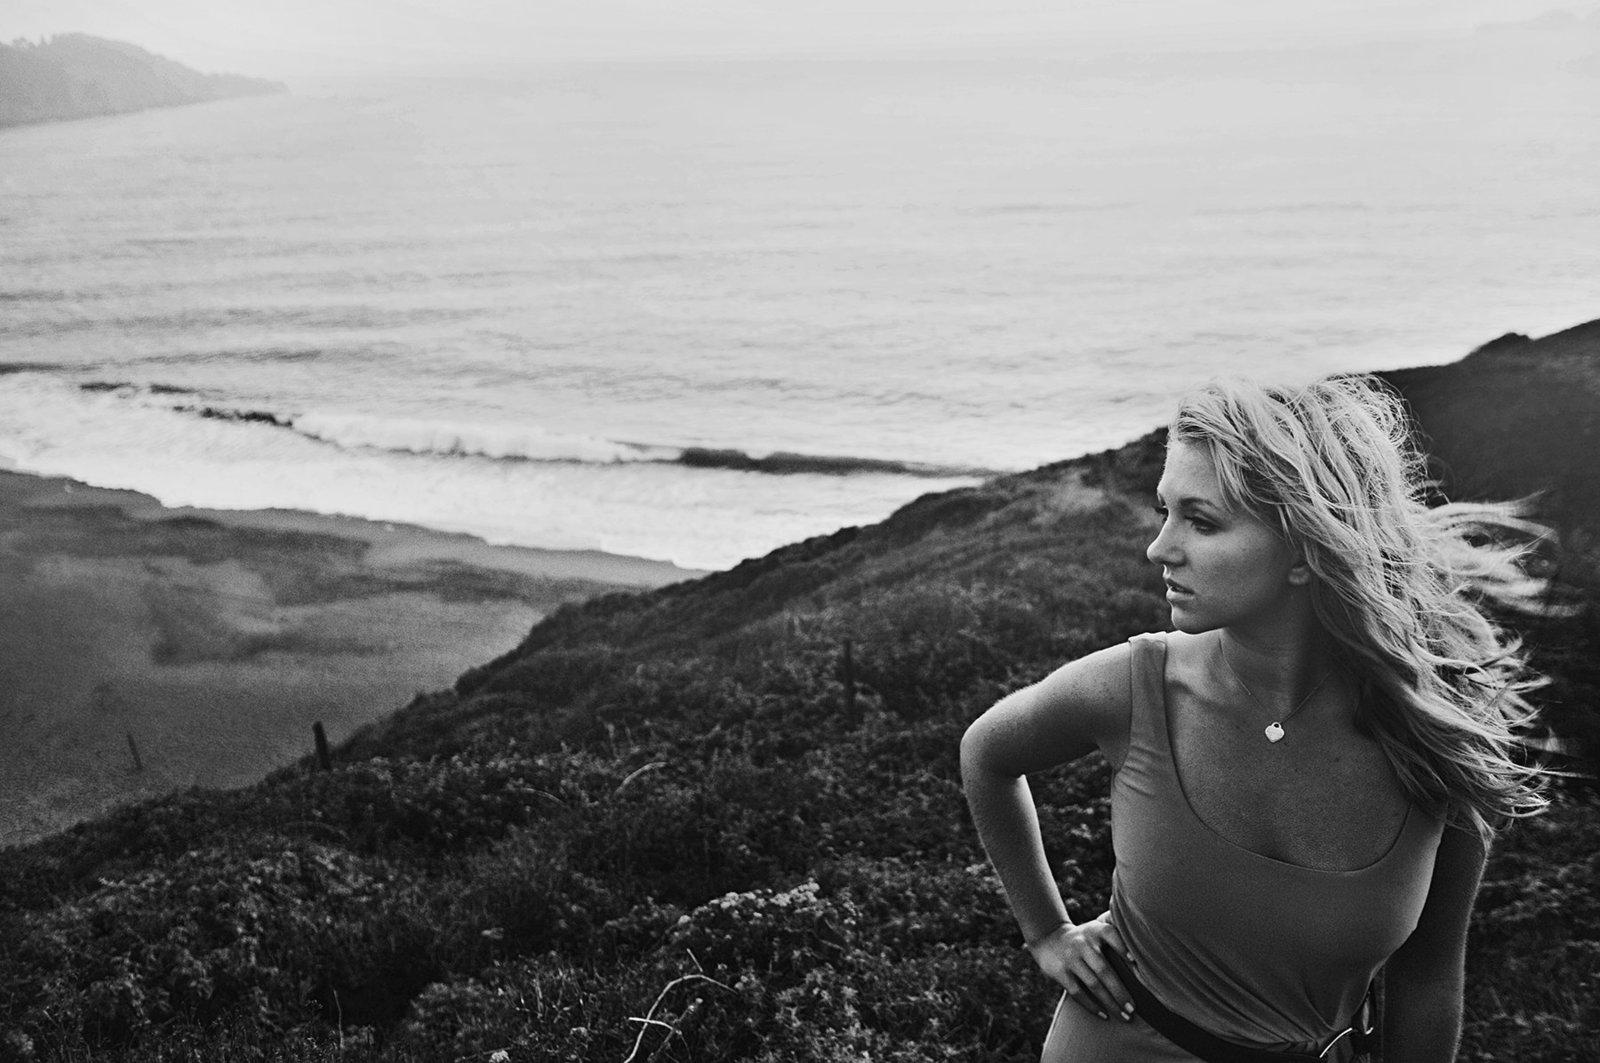 san francisco california senior photos destination portrait photographer bryan newfield photography 63